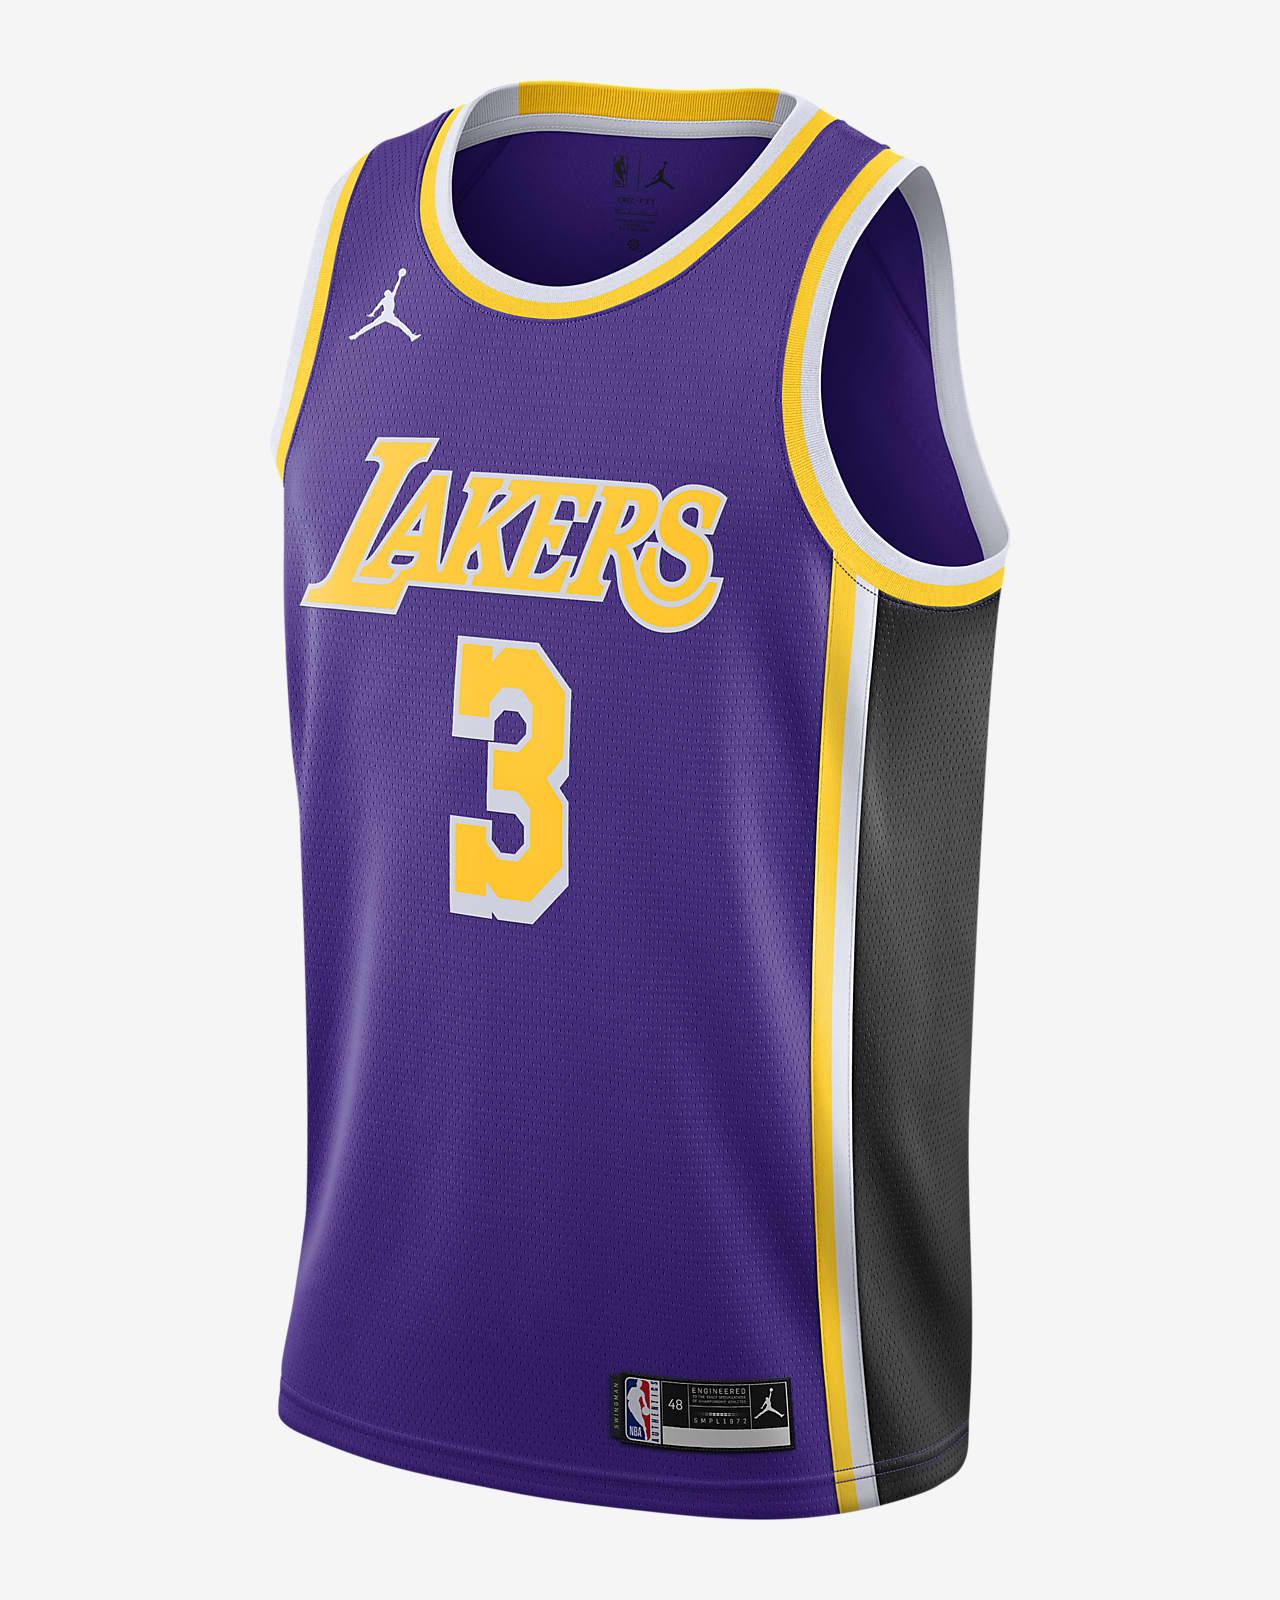 Anthony Davis (nba) Lakers Statement Edition 2020 Jordan NBA Swingman Jersey